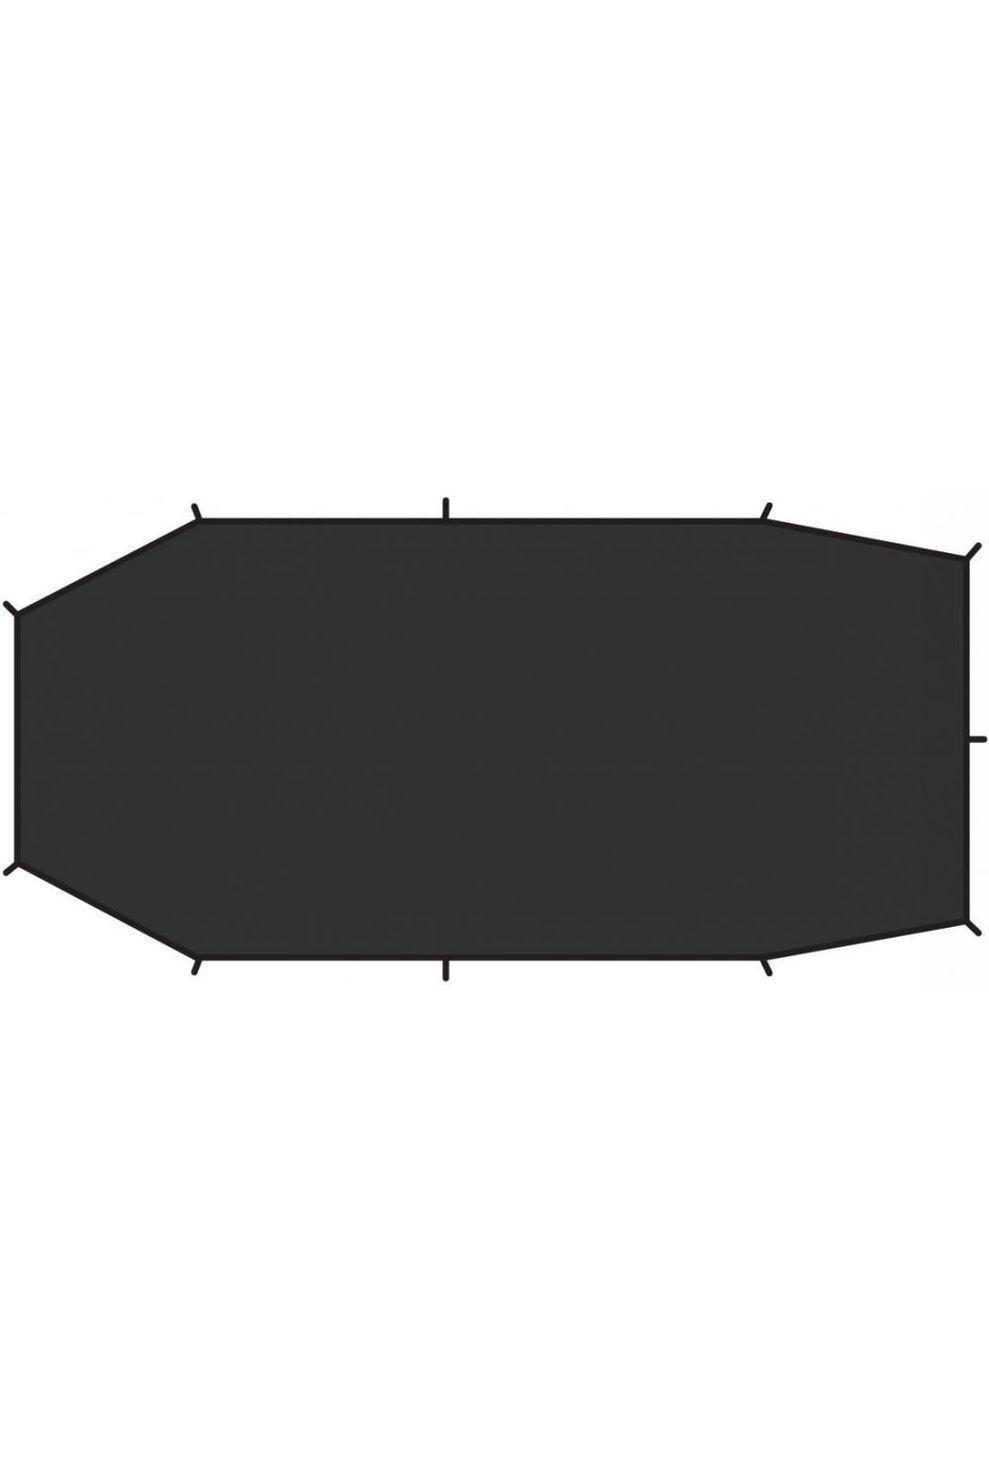 Fjällräven Grondzeil Endurance 3 Footprint - Zwart